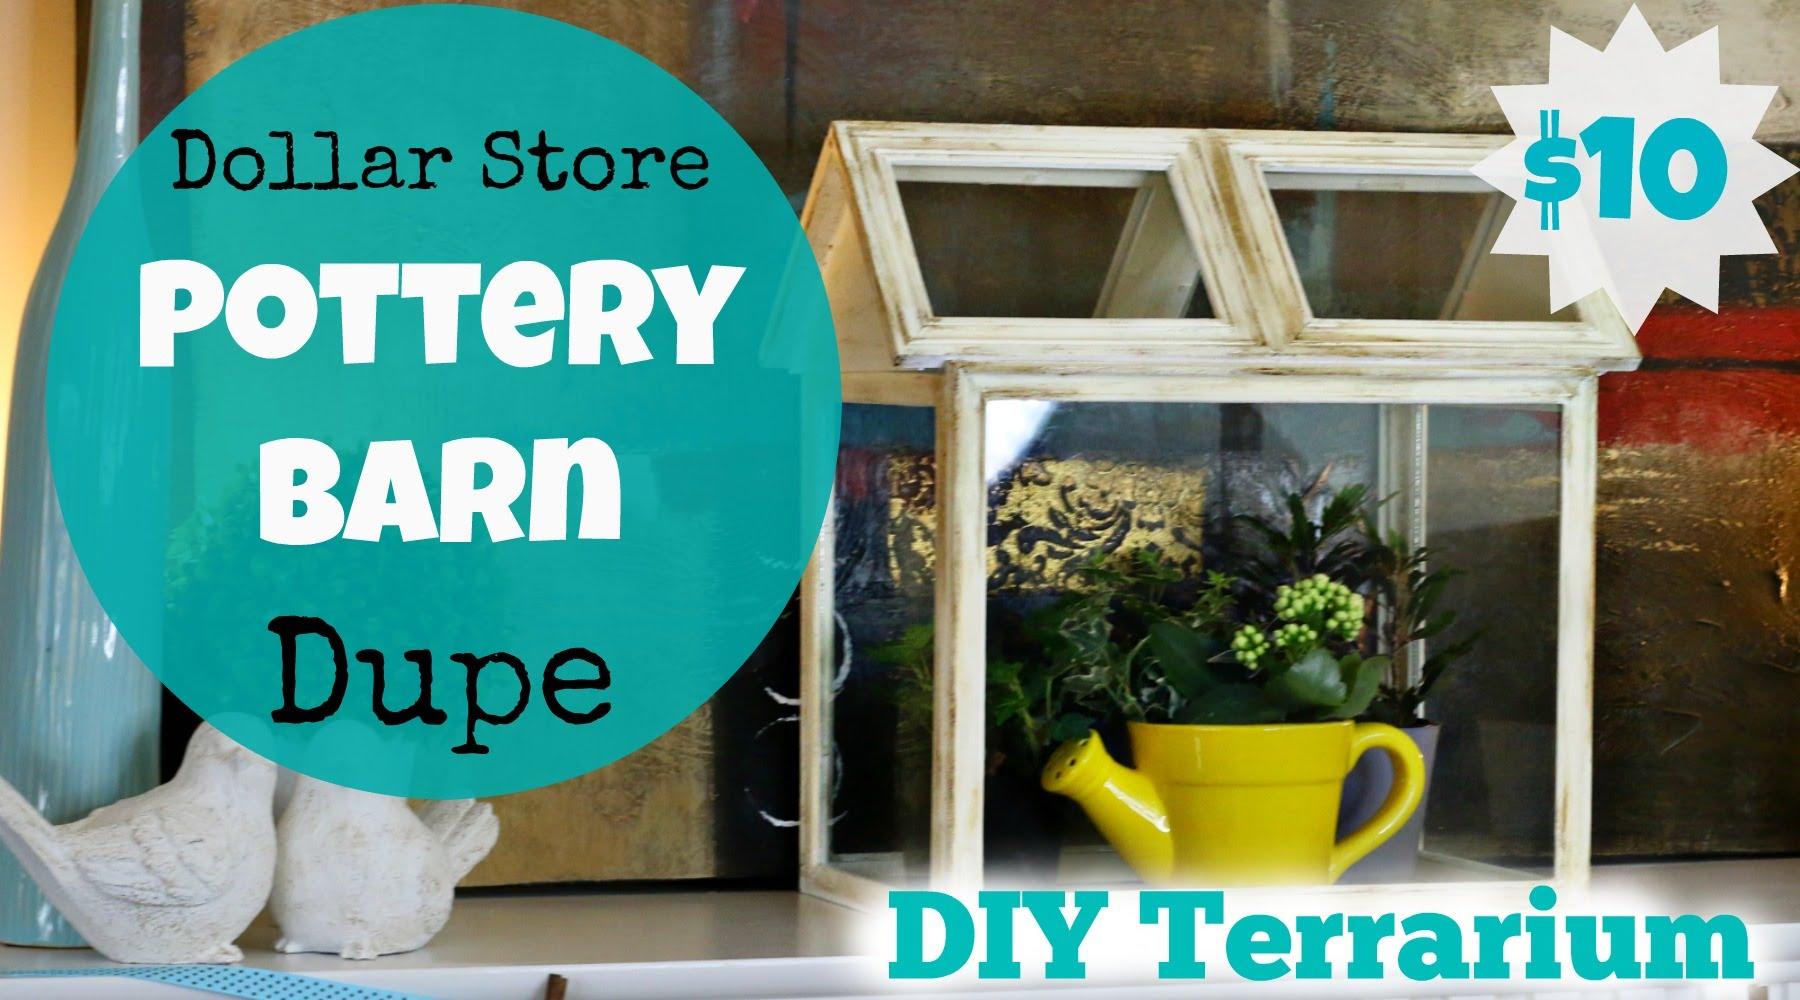 DIY Terrarium Ideas - DIY Pottery Barn Terrarium - Cool Terrariums and Crafts With Mason Jars, Succulents, Wood, Geometric Designs and Reptile, Acquarium - Easy DIY Terrariums for Adults and Kids To Make at Home http://diyjoy.com/diy-terrarium-ideas